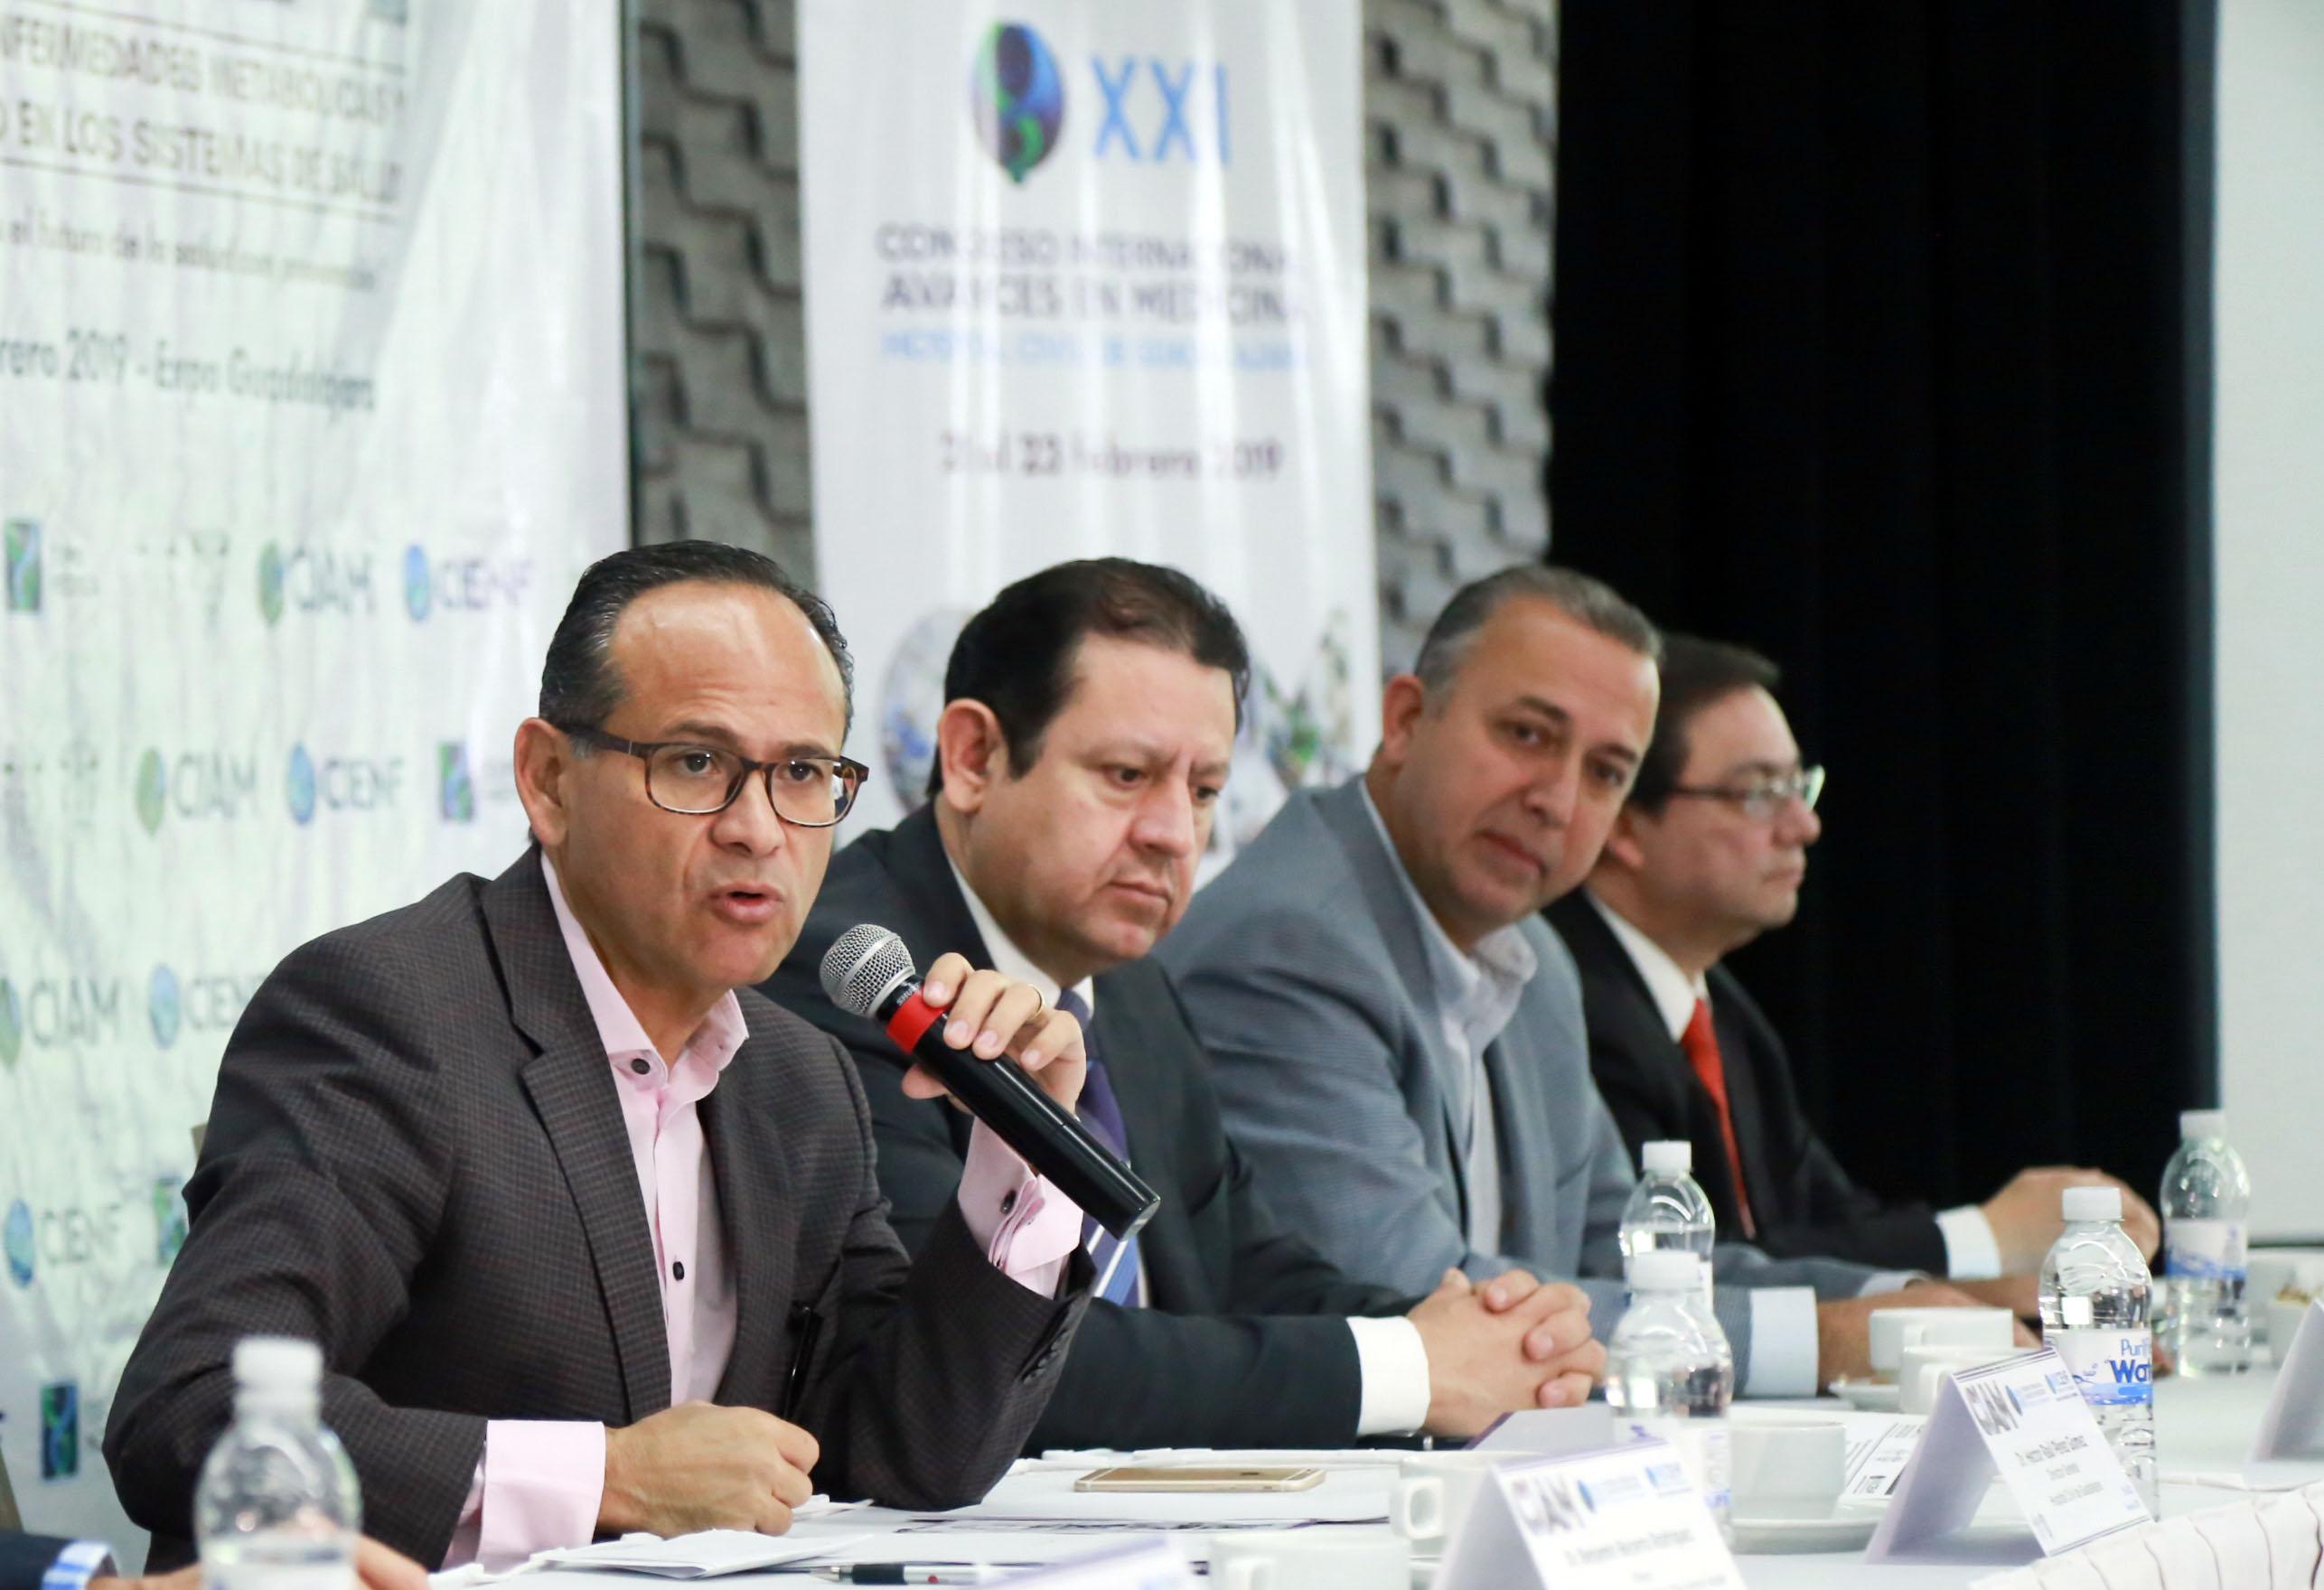 El doctor Héctor Raúl Pérez Gómez  hablando al micrófono desde la mesa del presidium